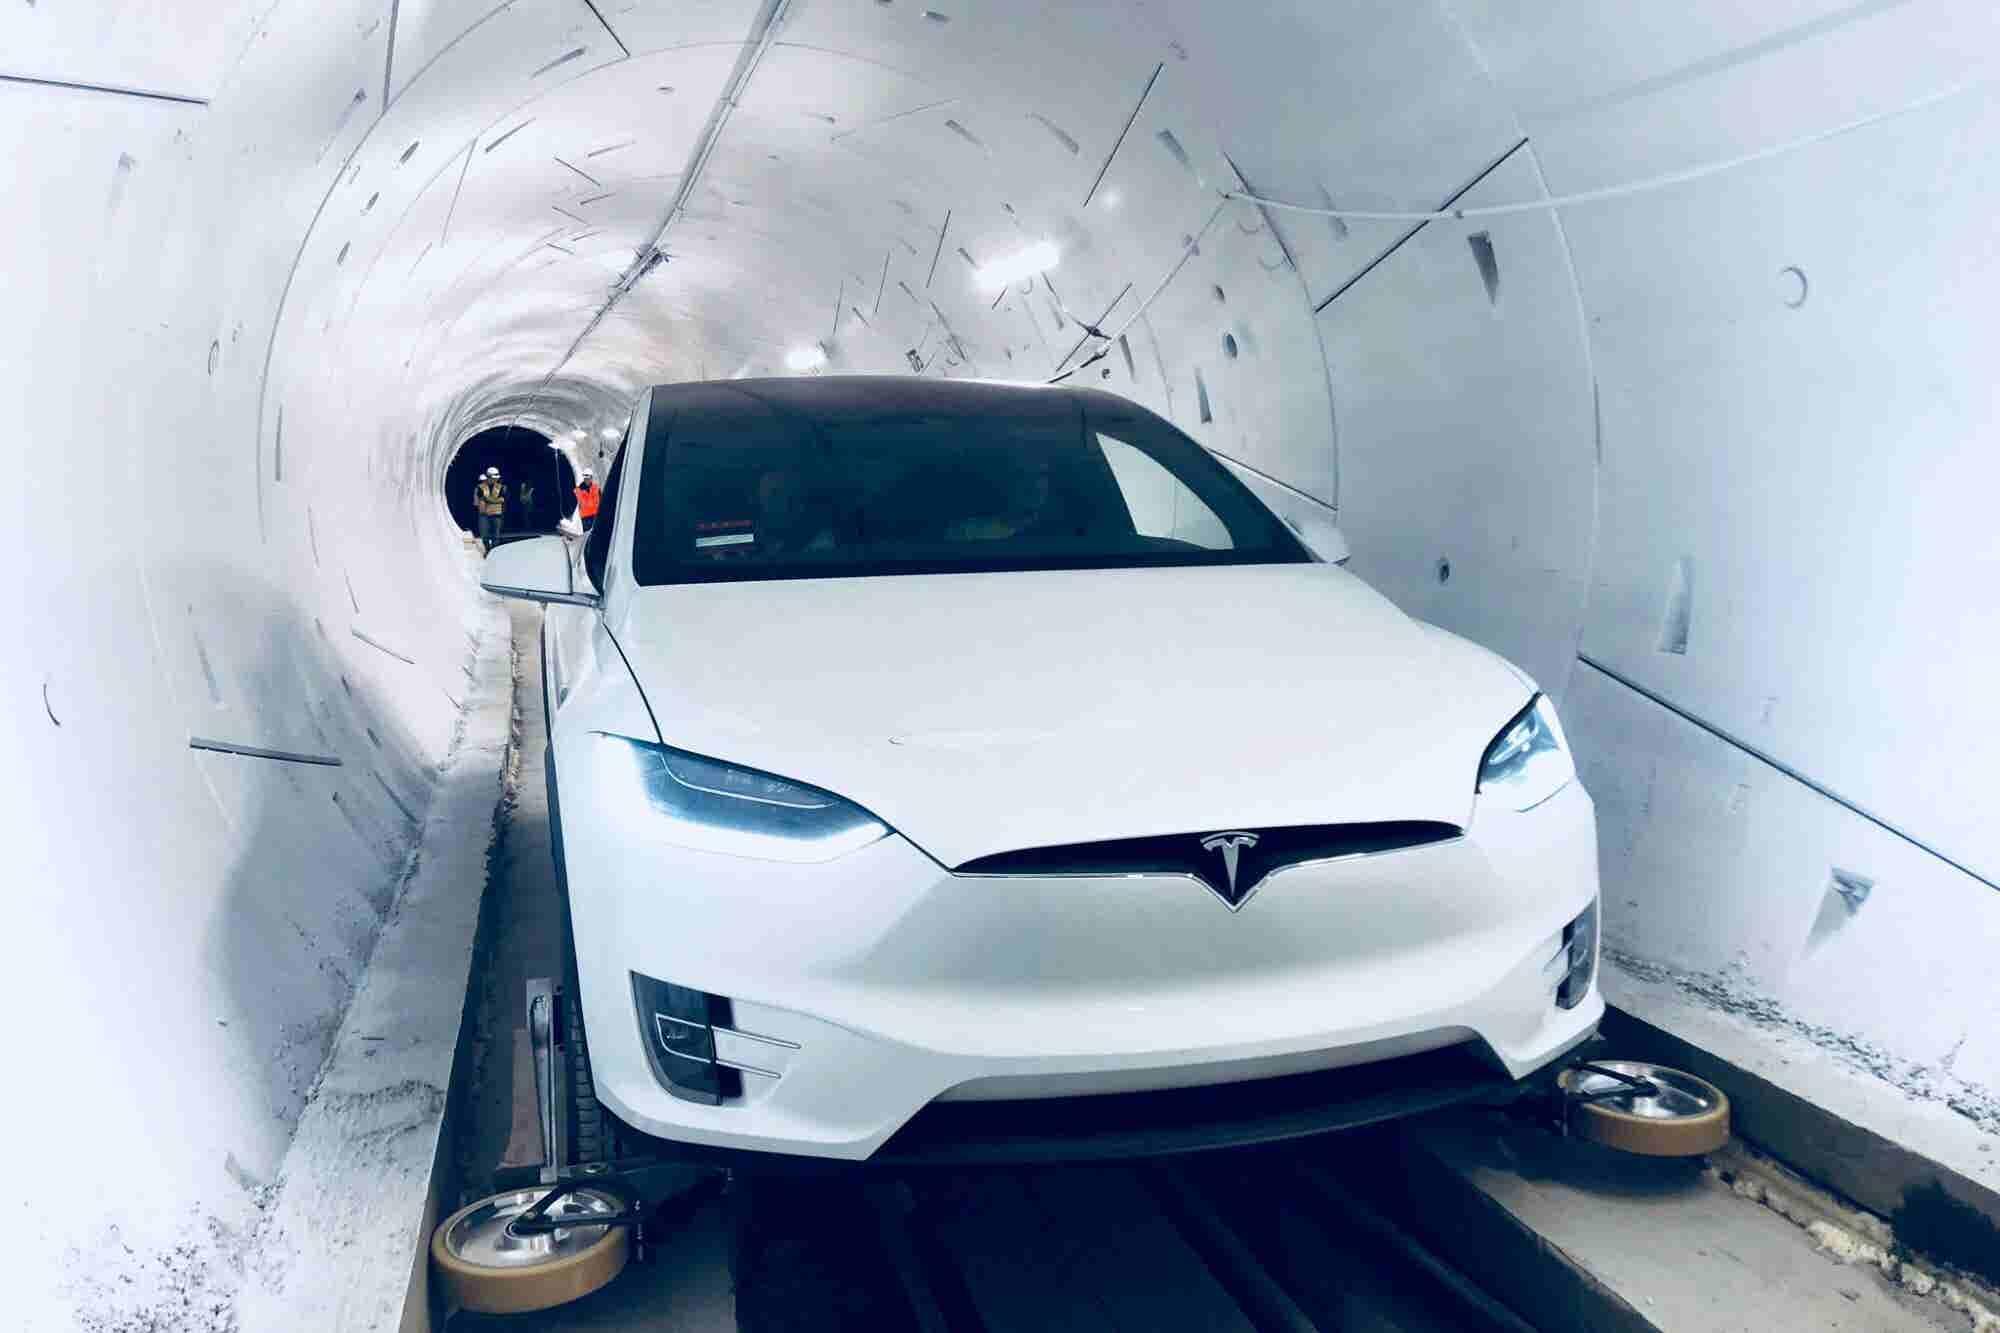 Elon Musk's L.A. Tunnel Turns Teslas Into a 'Rail-Guided Train'